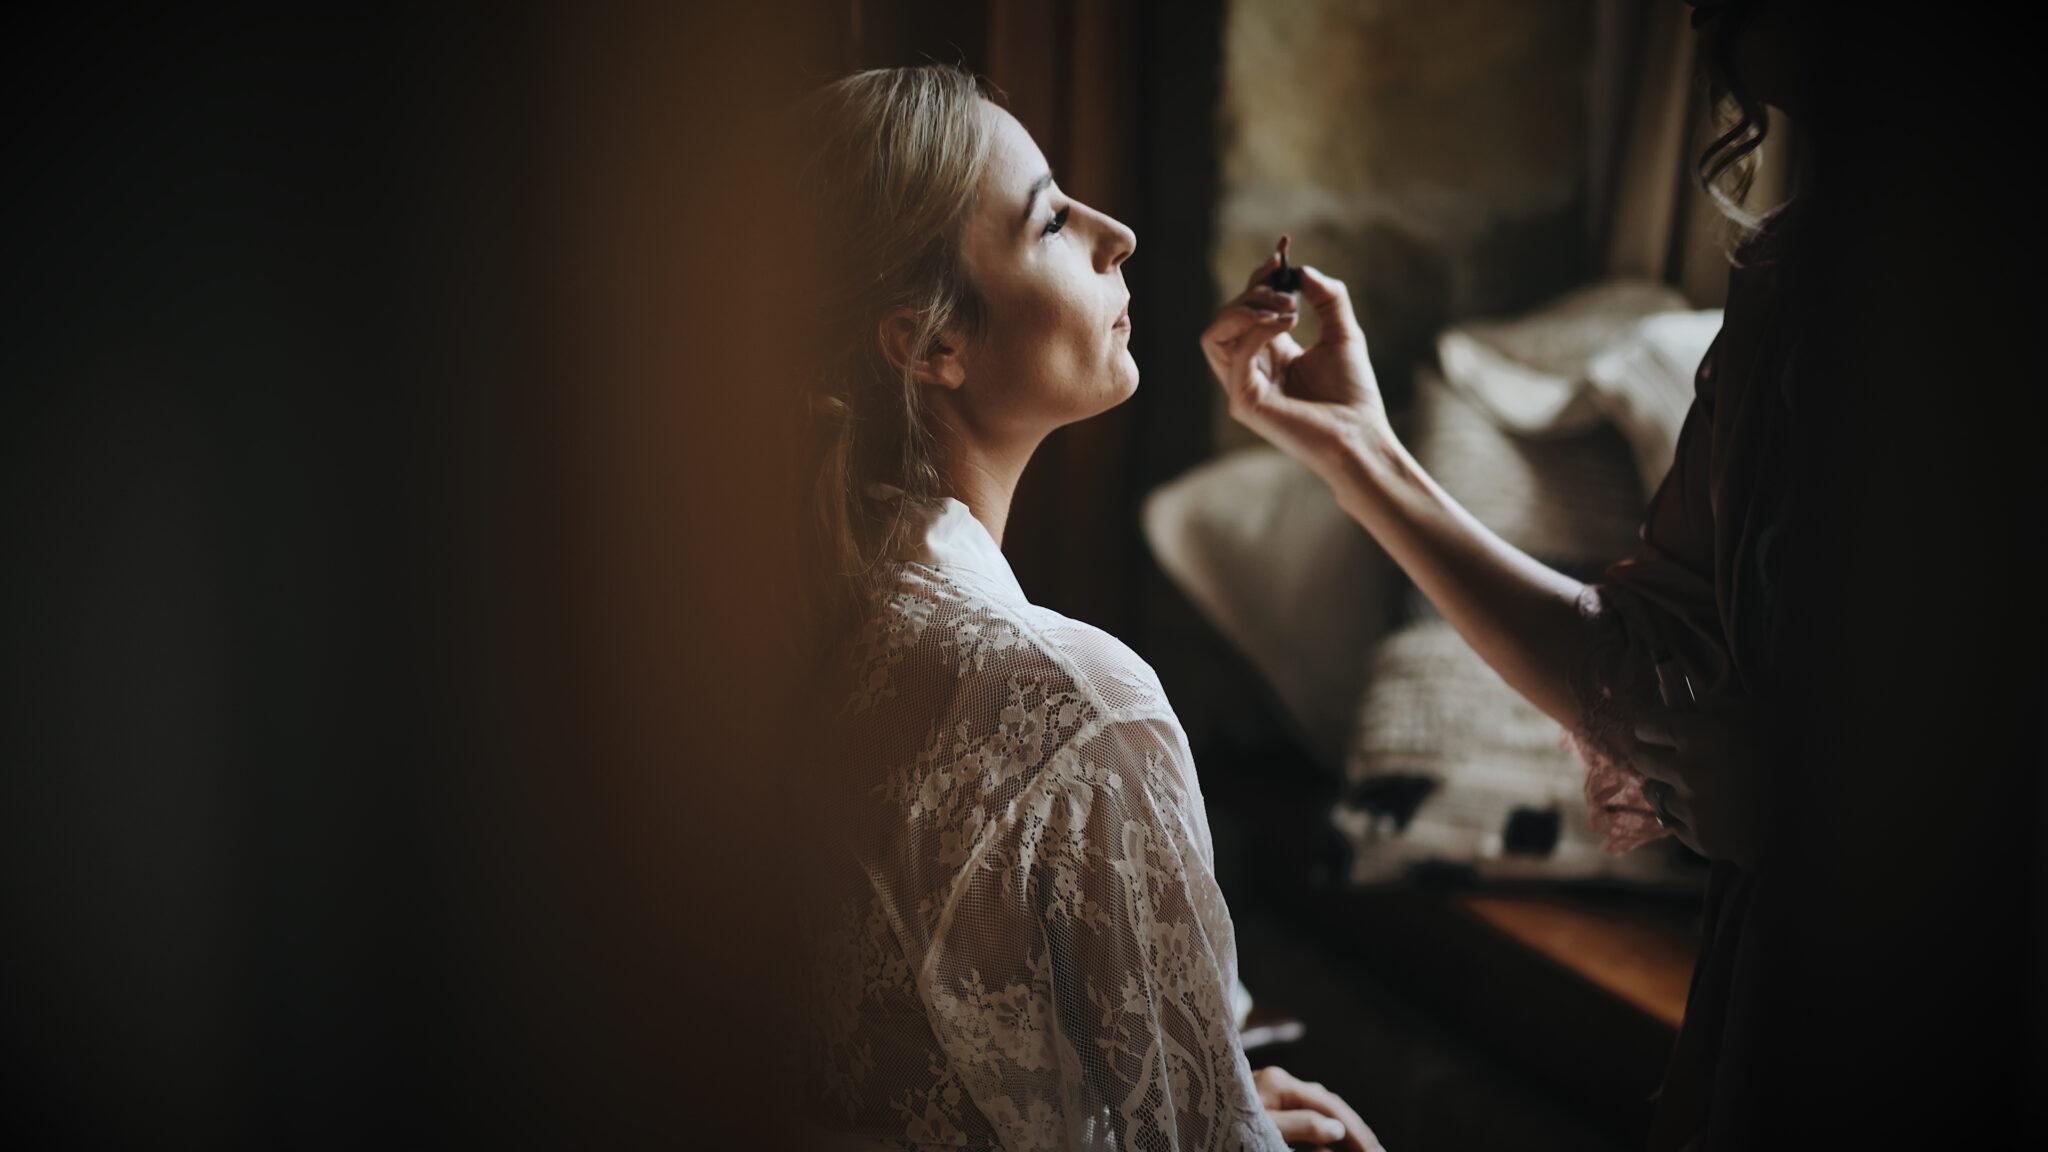 Image of bride in a dark room taken from her wedding film